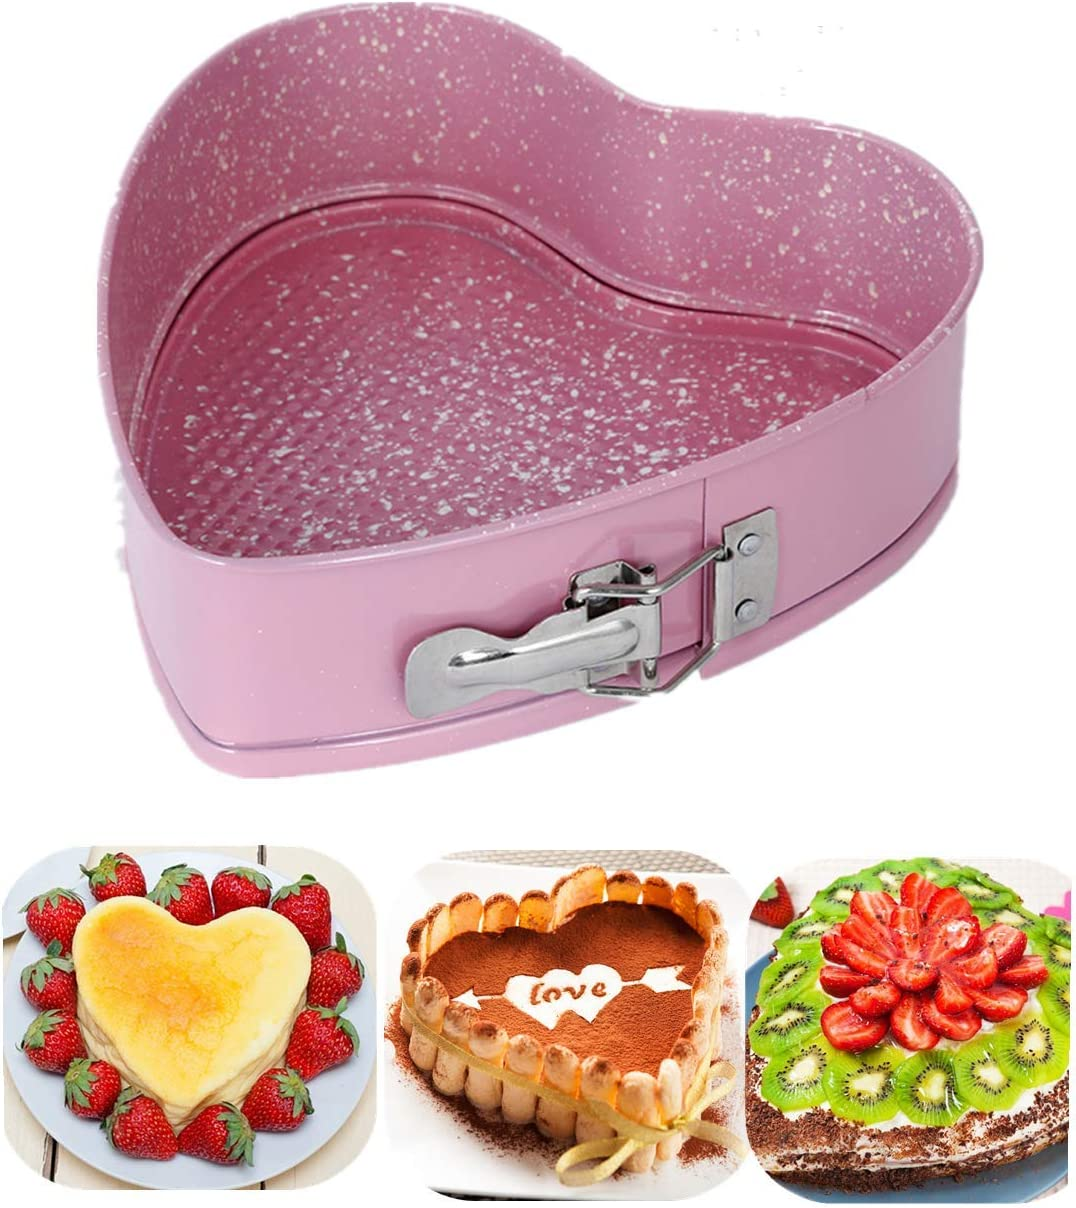 8.5 Pink Heart Springform Cake Pan Nonstick Heart Bakeware Pan Cake Mold for Baker Heart Shape Cheesecake Baking Pan with Removable Bottom